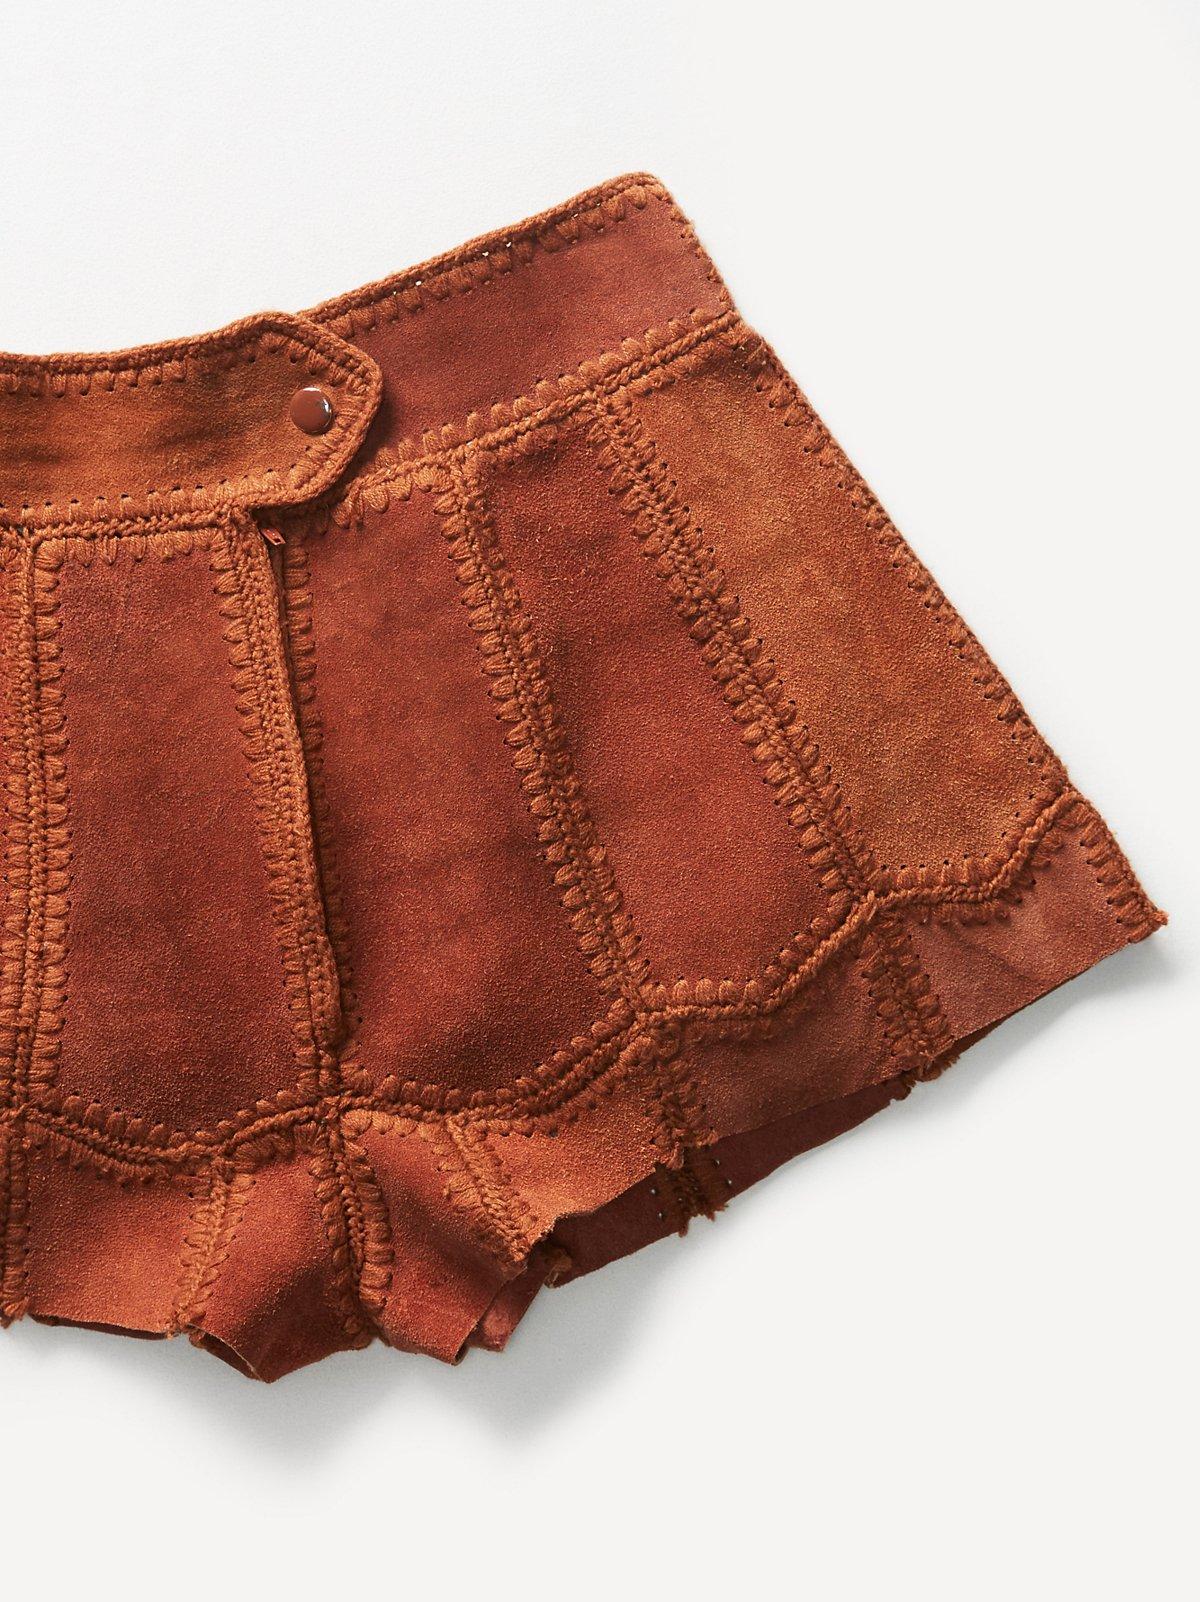 Vintage 1970s Suede Patchwork Shorts